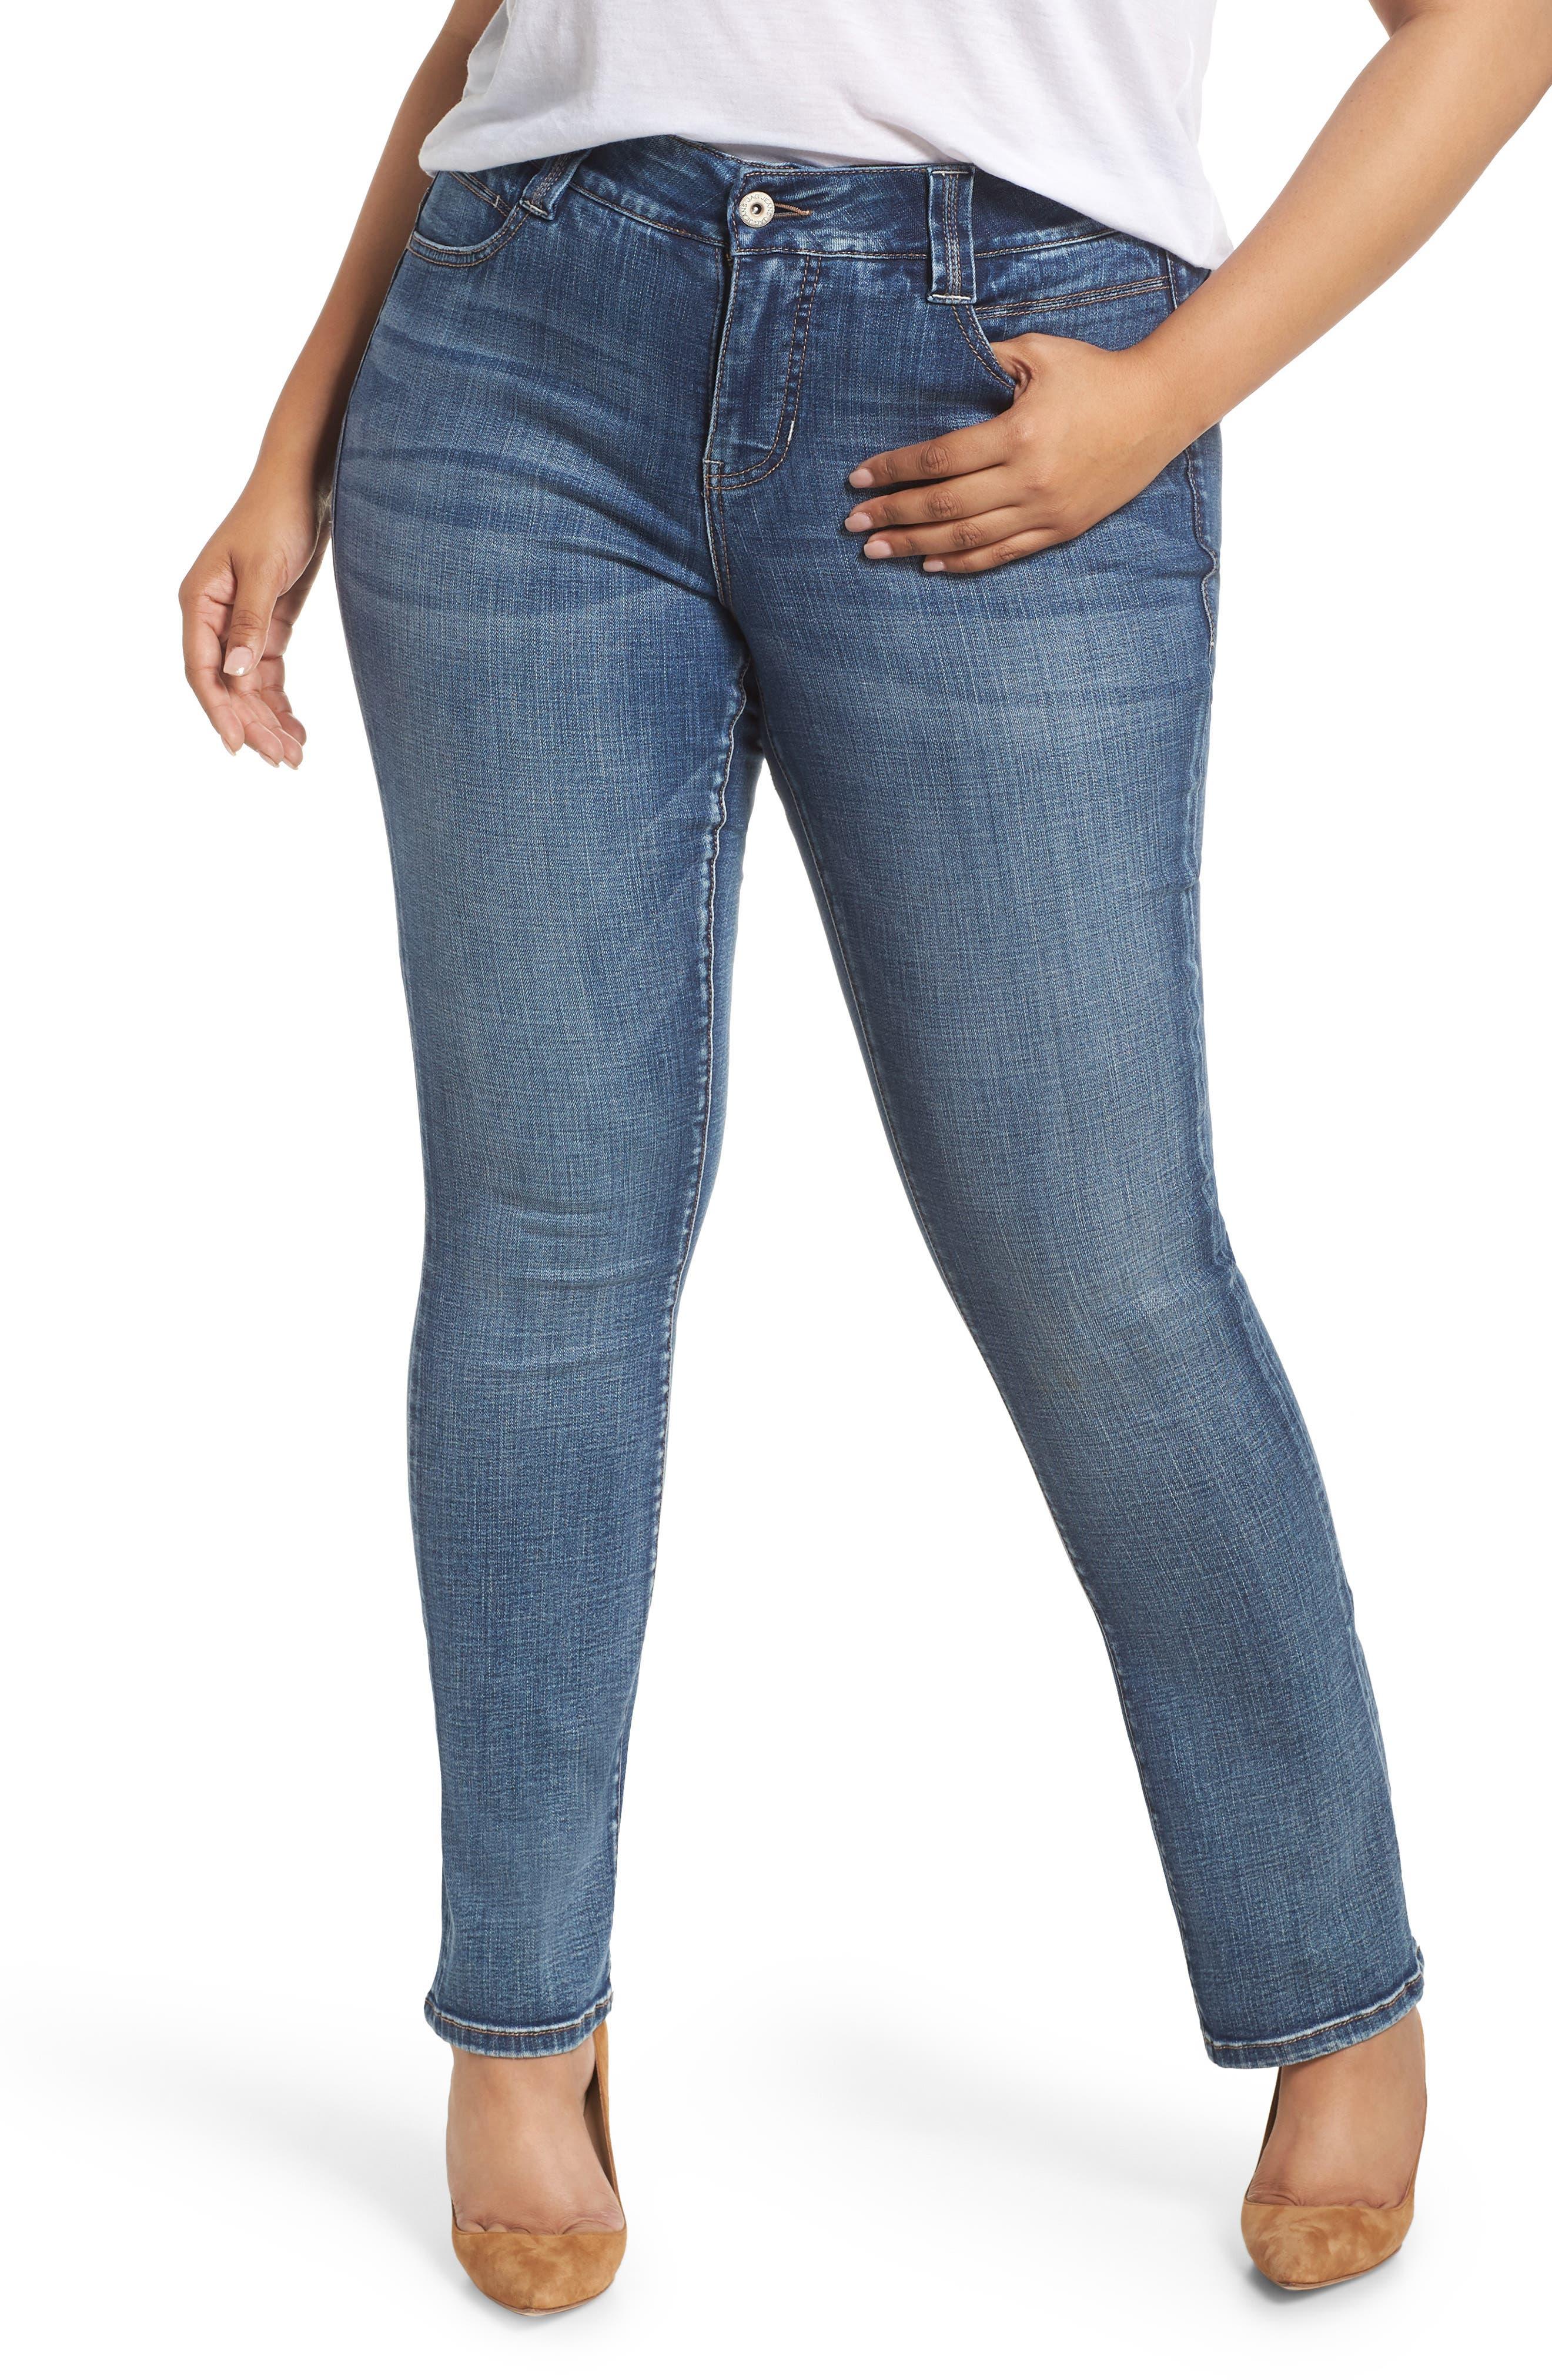 JAG JEANS Eloise Bootcut Stretch Jeans, Main, color, MED INDIGO